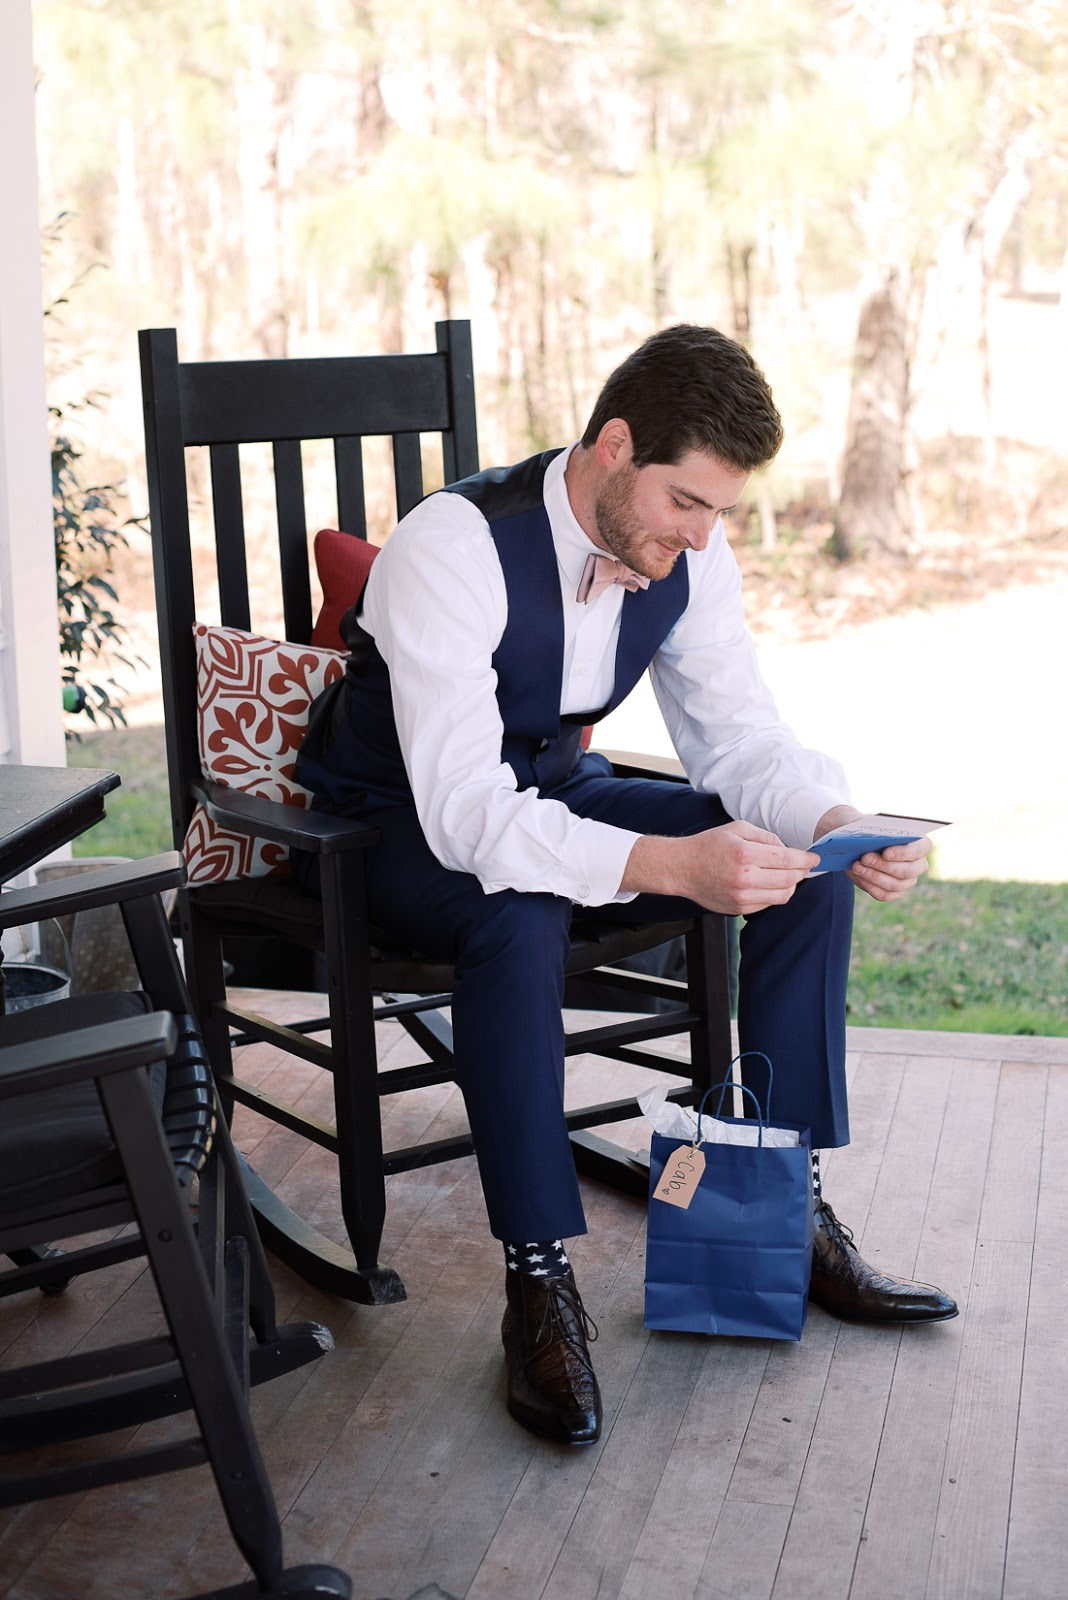 Wedding Gift for Husband - Chasing Cinderella